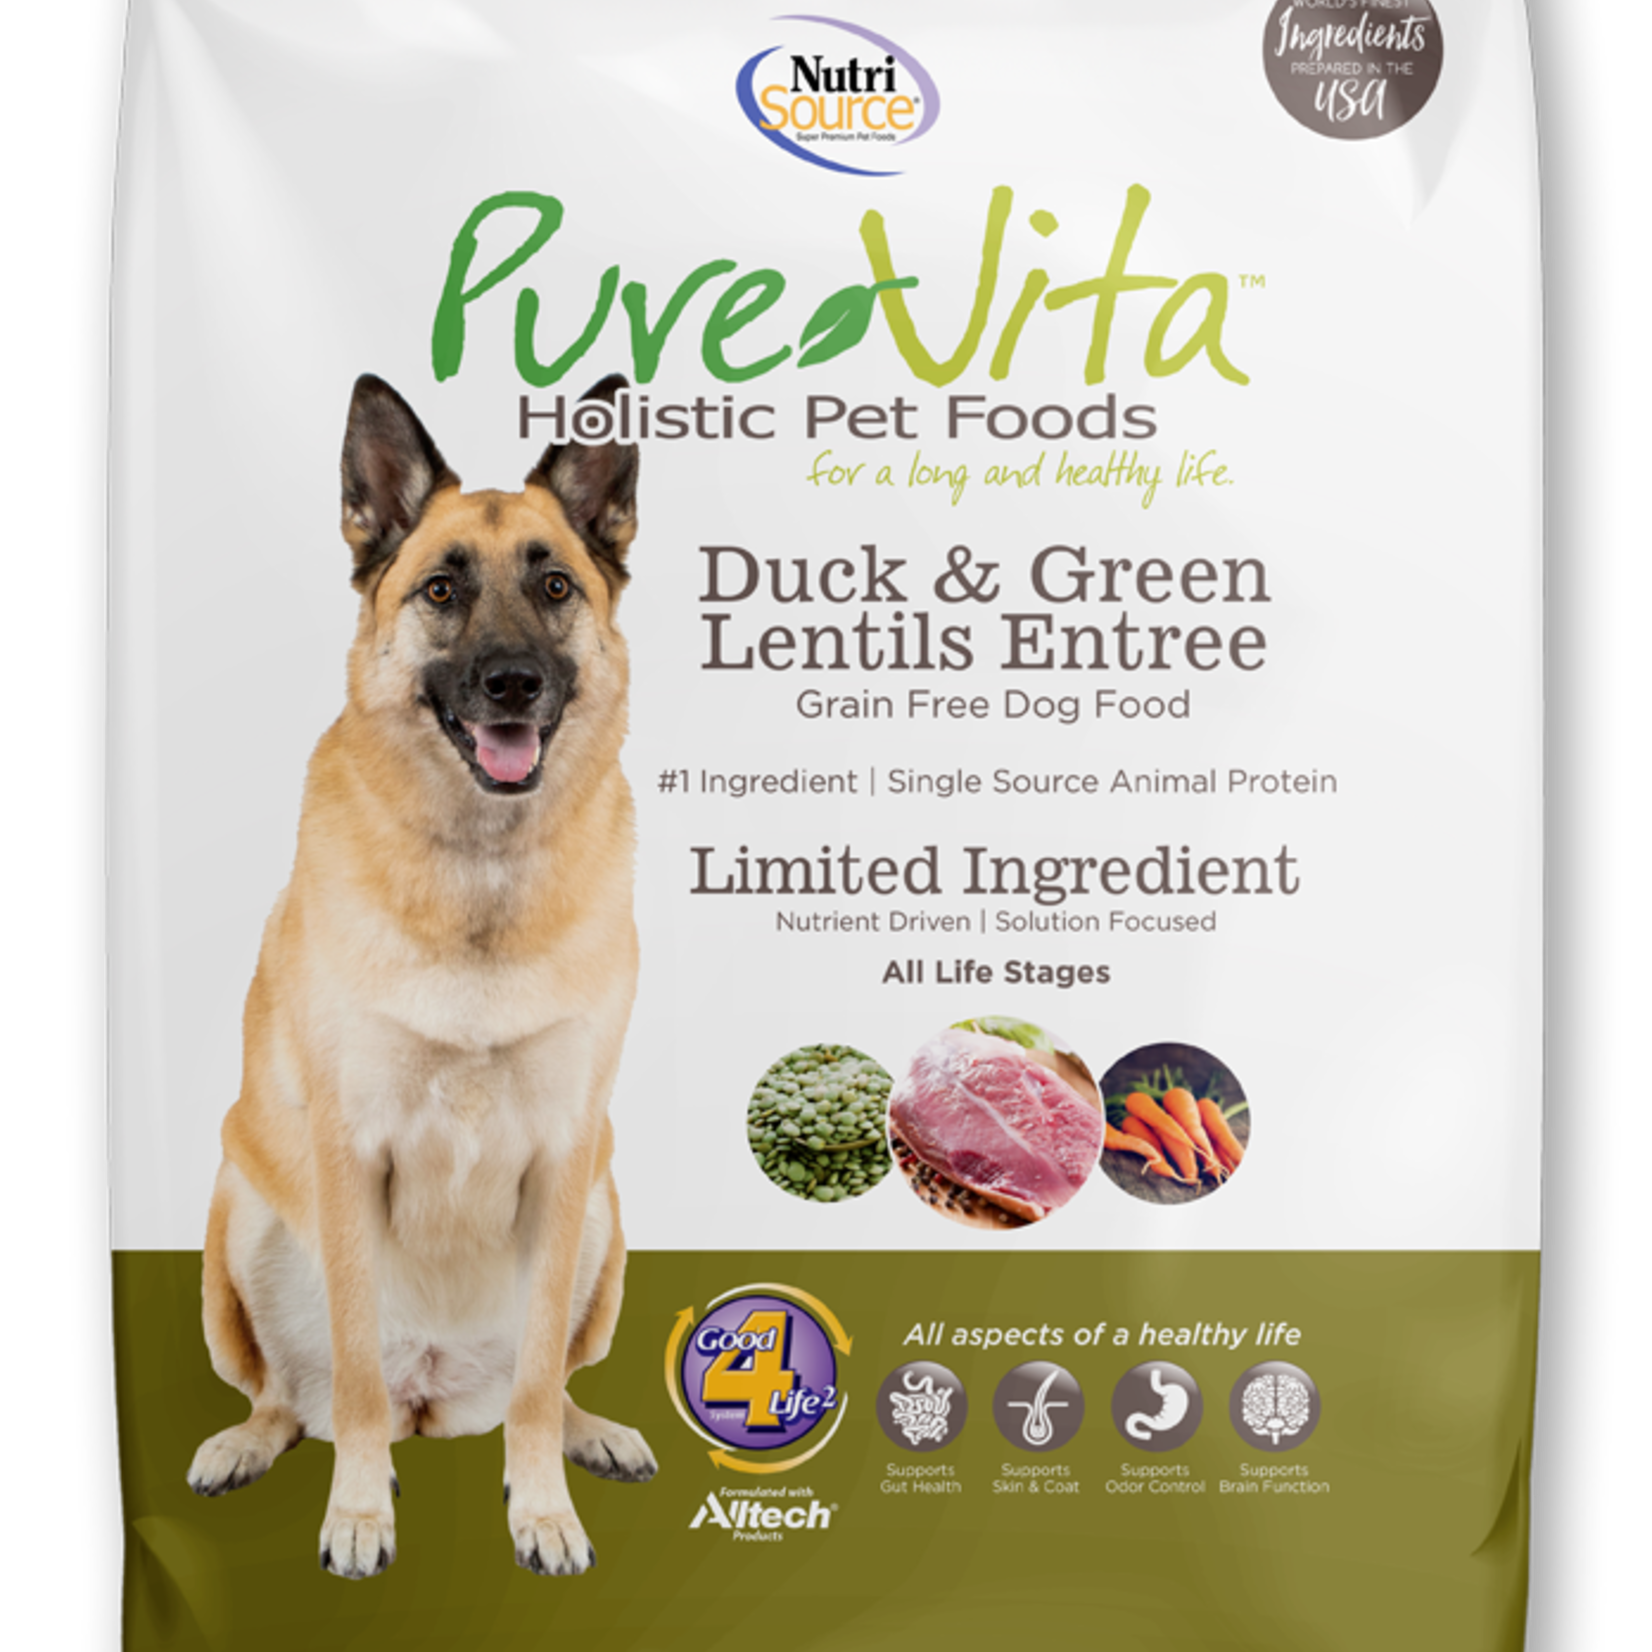 PureVita Pure Vita Dog GF Duck & Green Lentils 25#